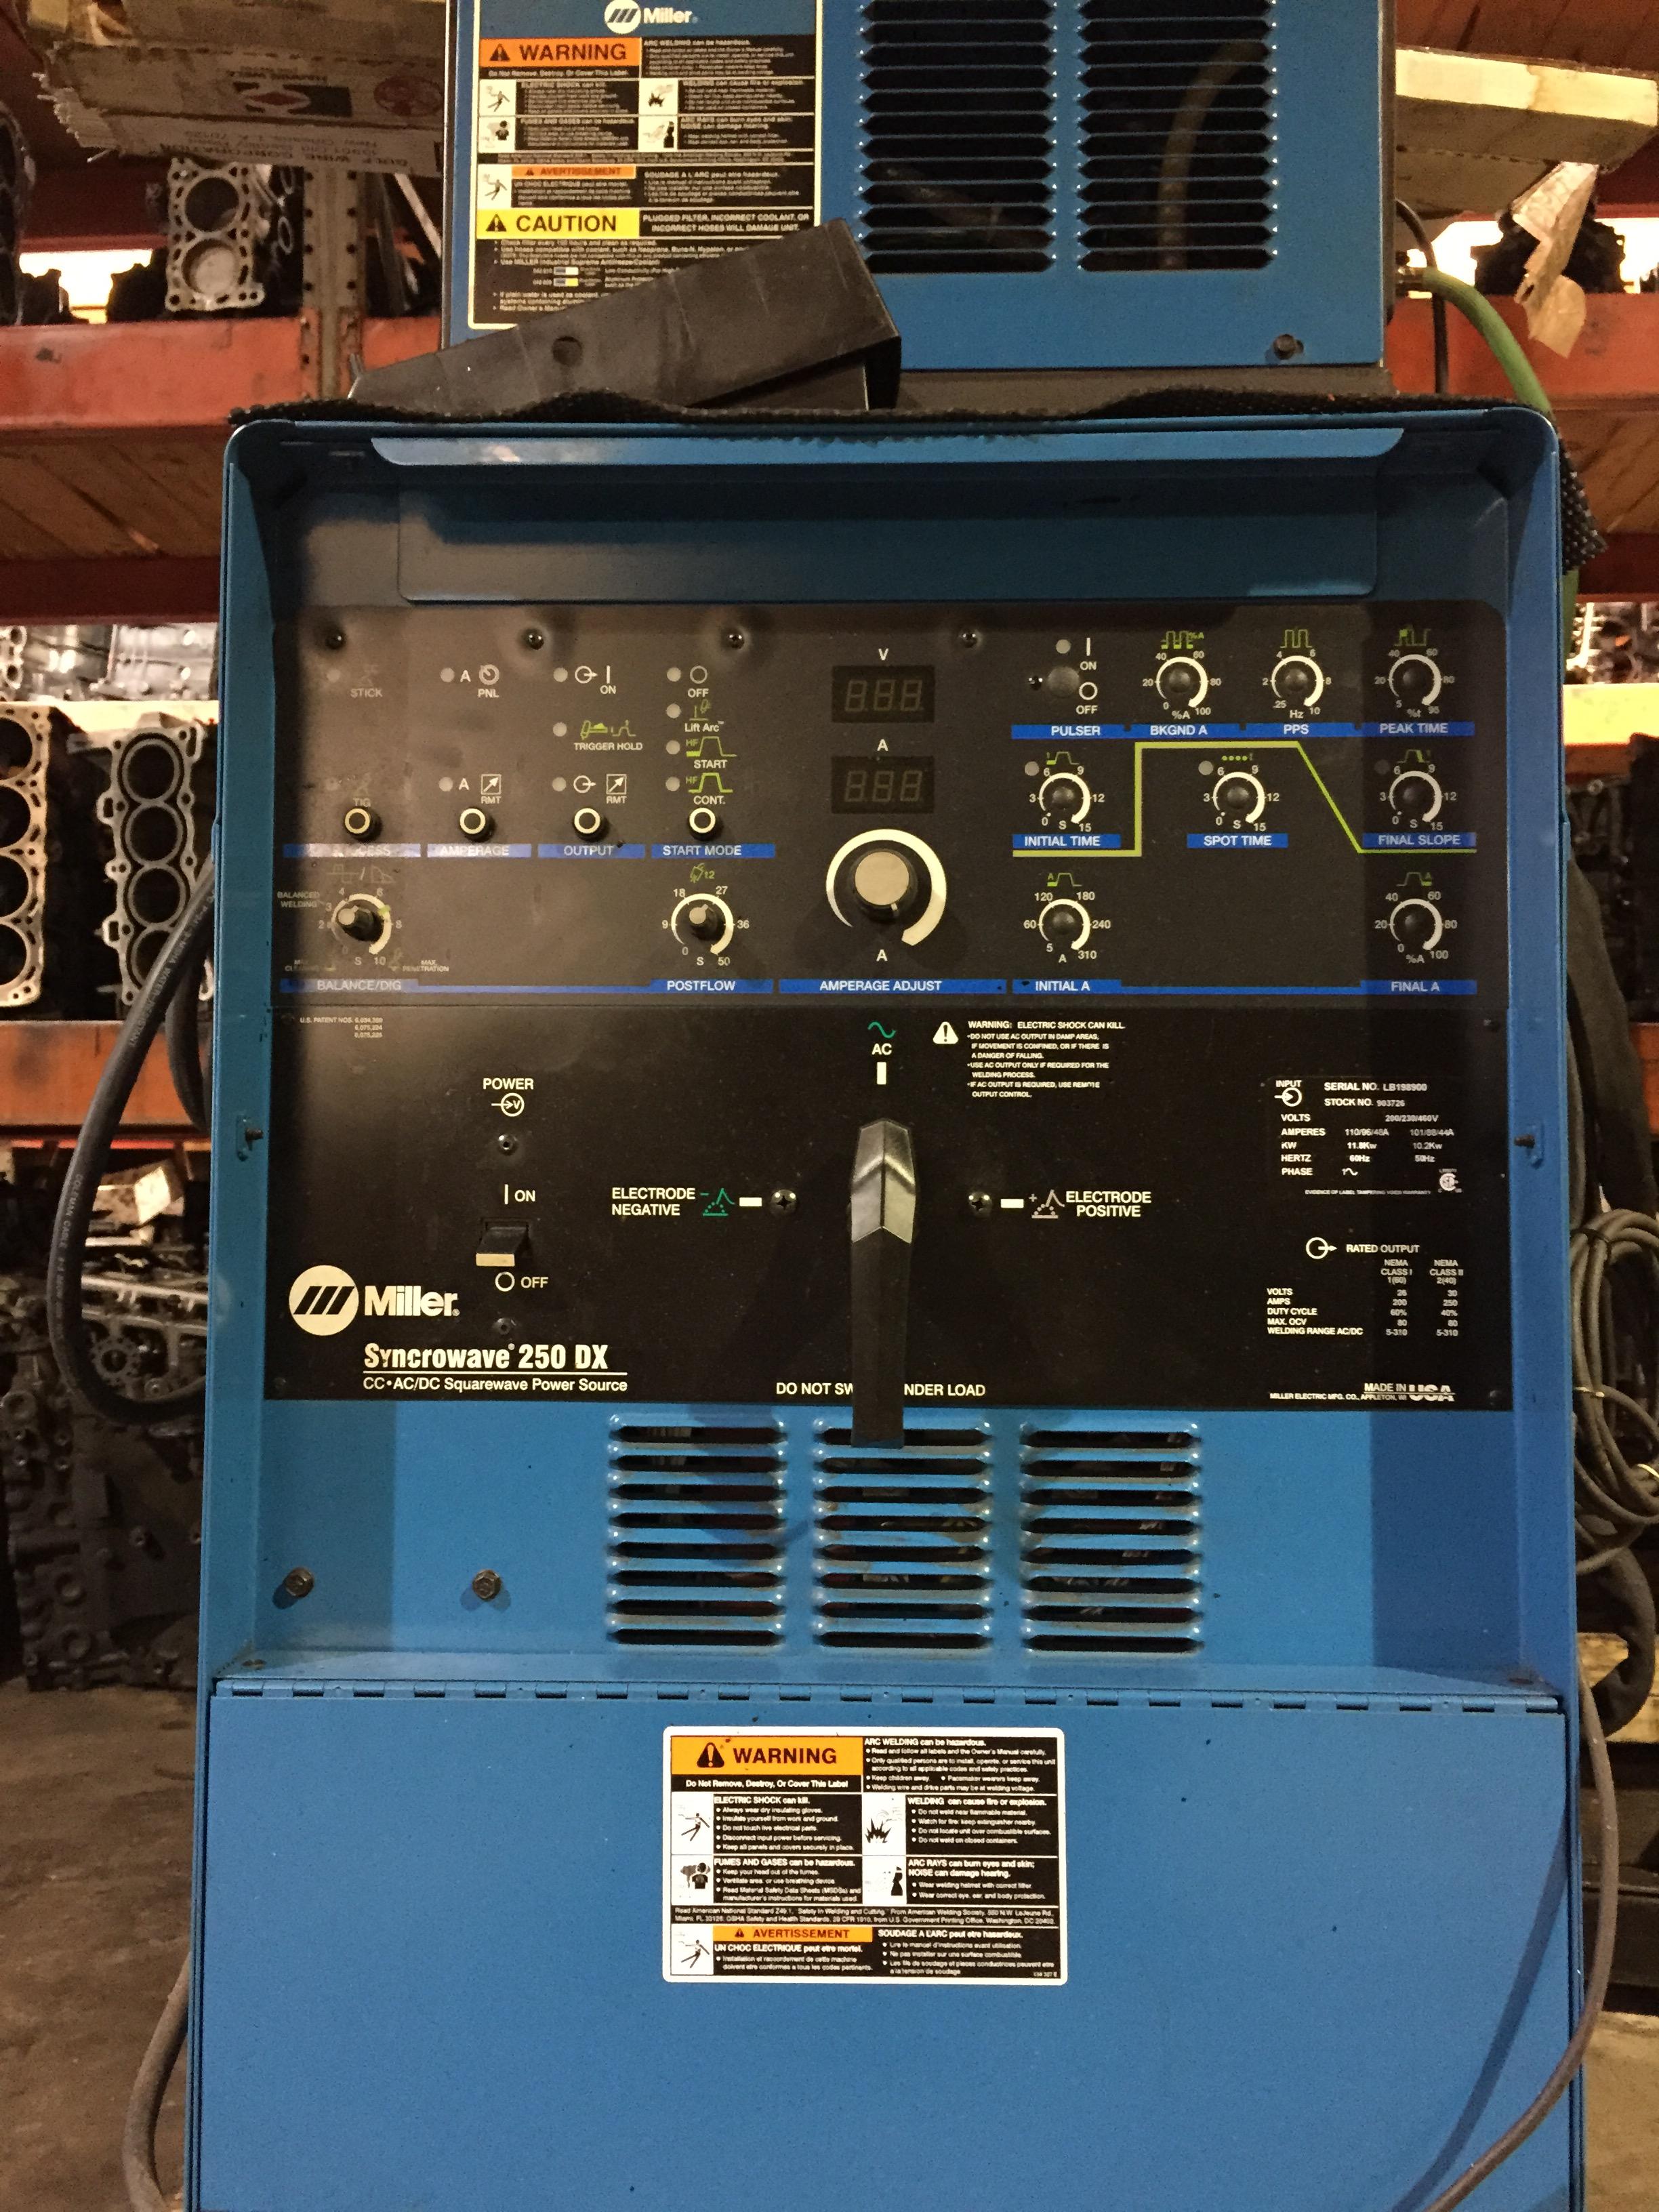 Miller Welding Machine Used Syncrowave 250 Dx Welder Ebay